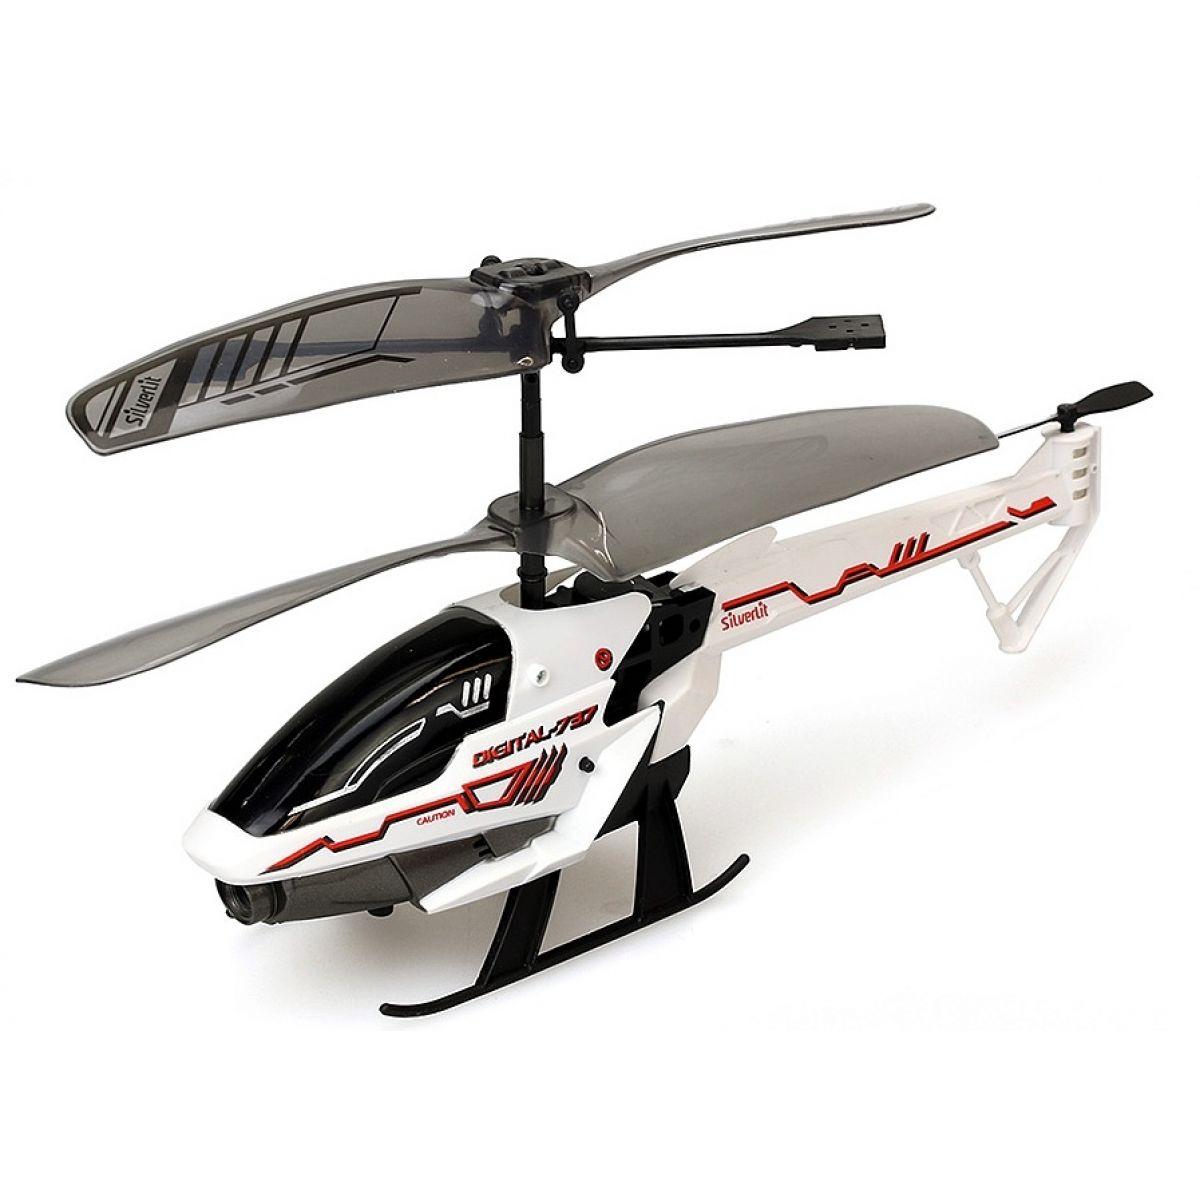 SILVERLIT RC helikoptéra Spy Cam III s kamerou biela